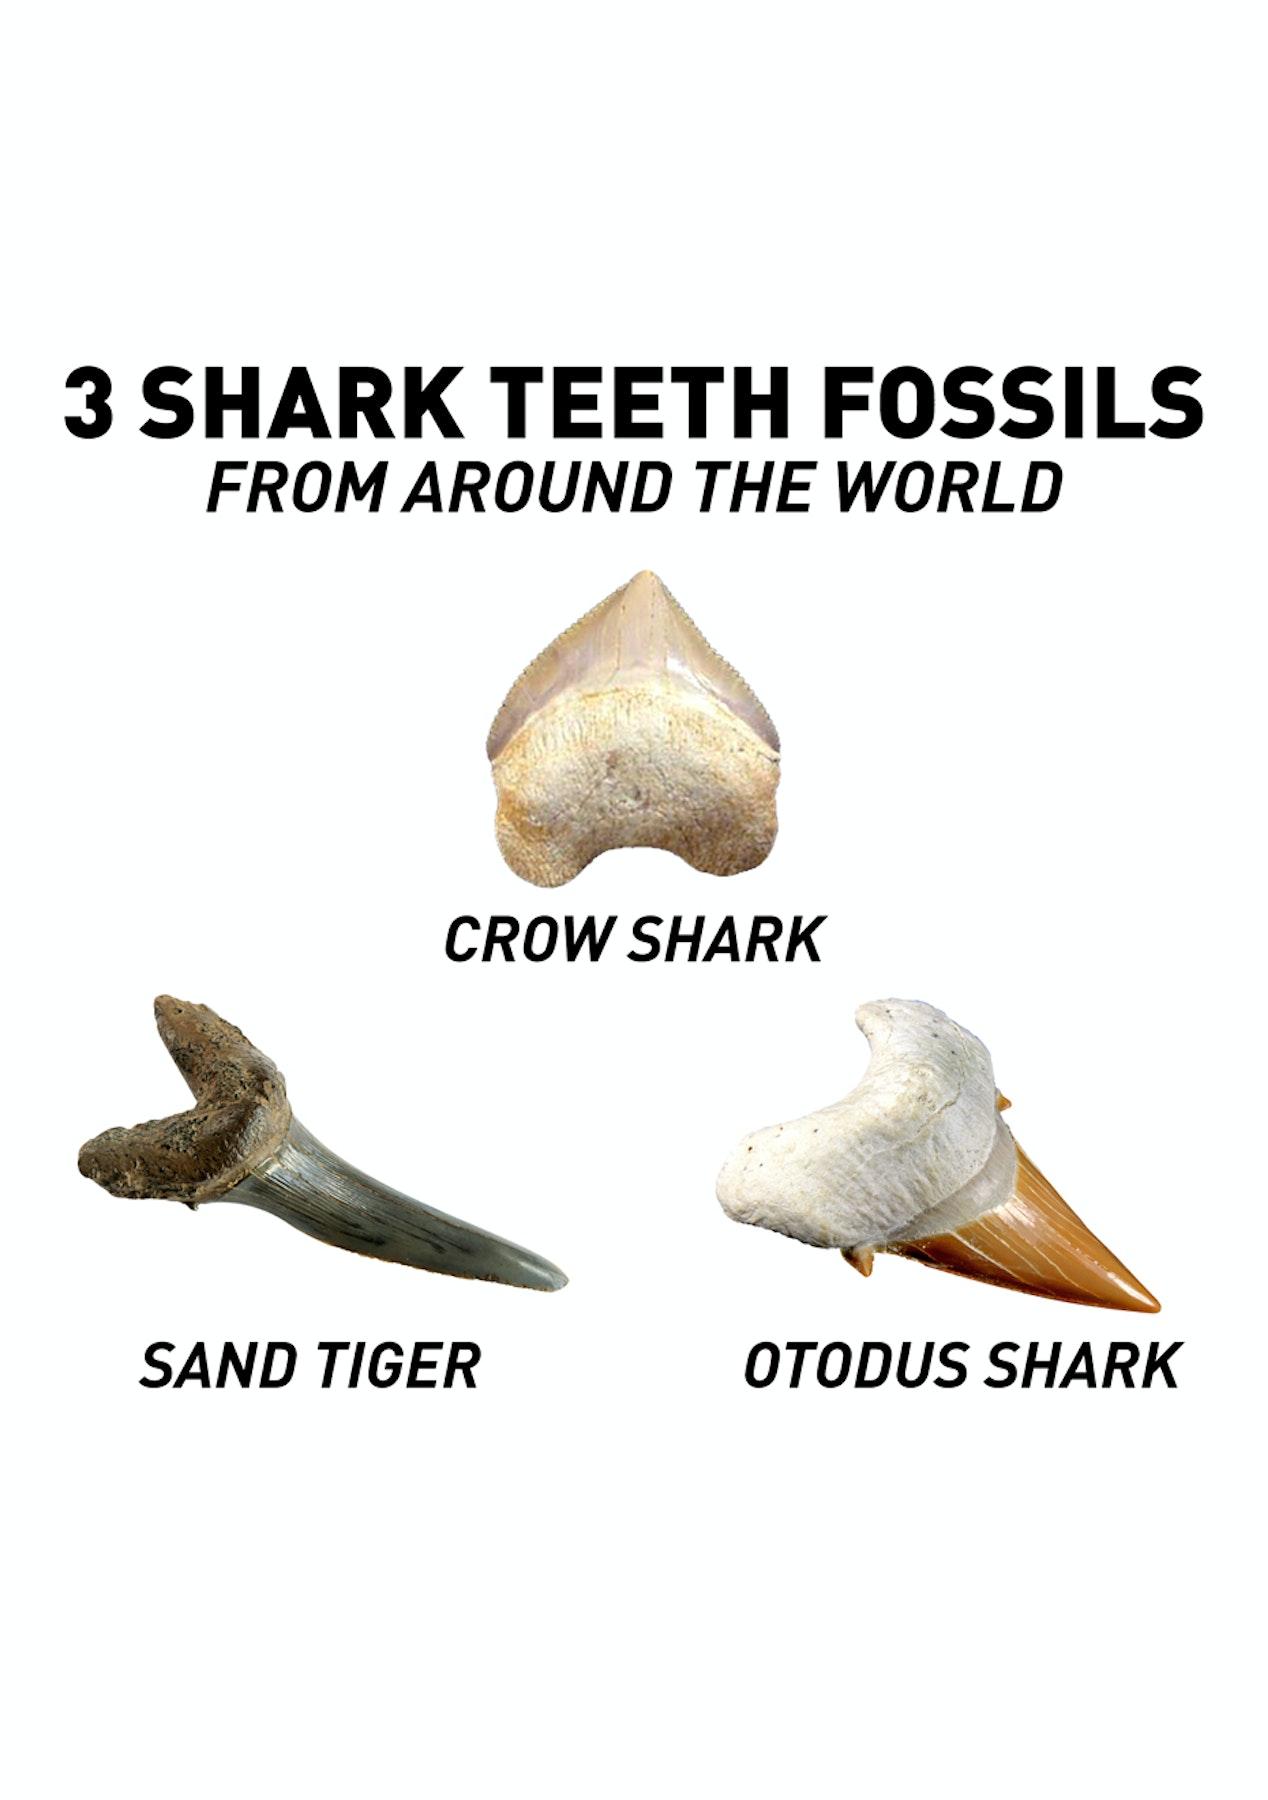 National Geographic - Shark Dig Kit